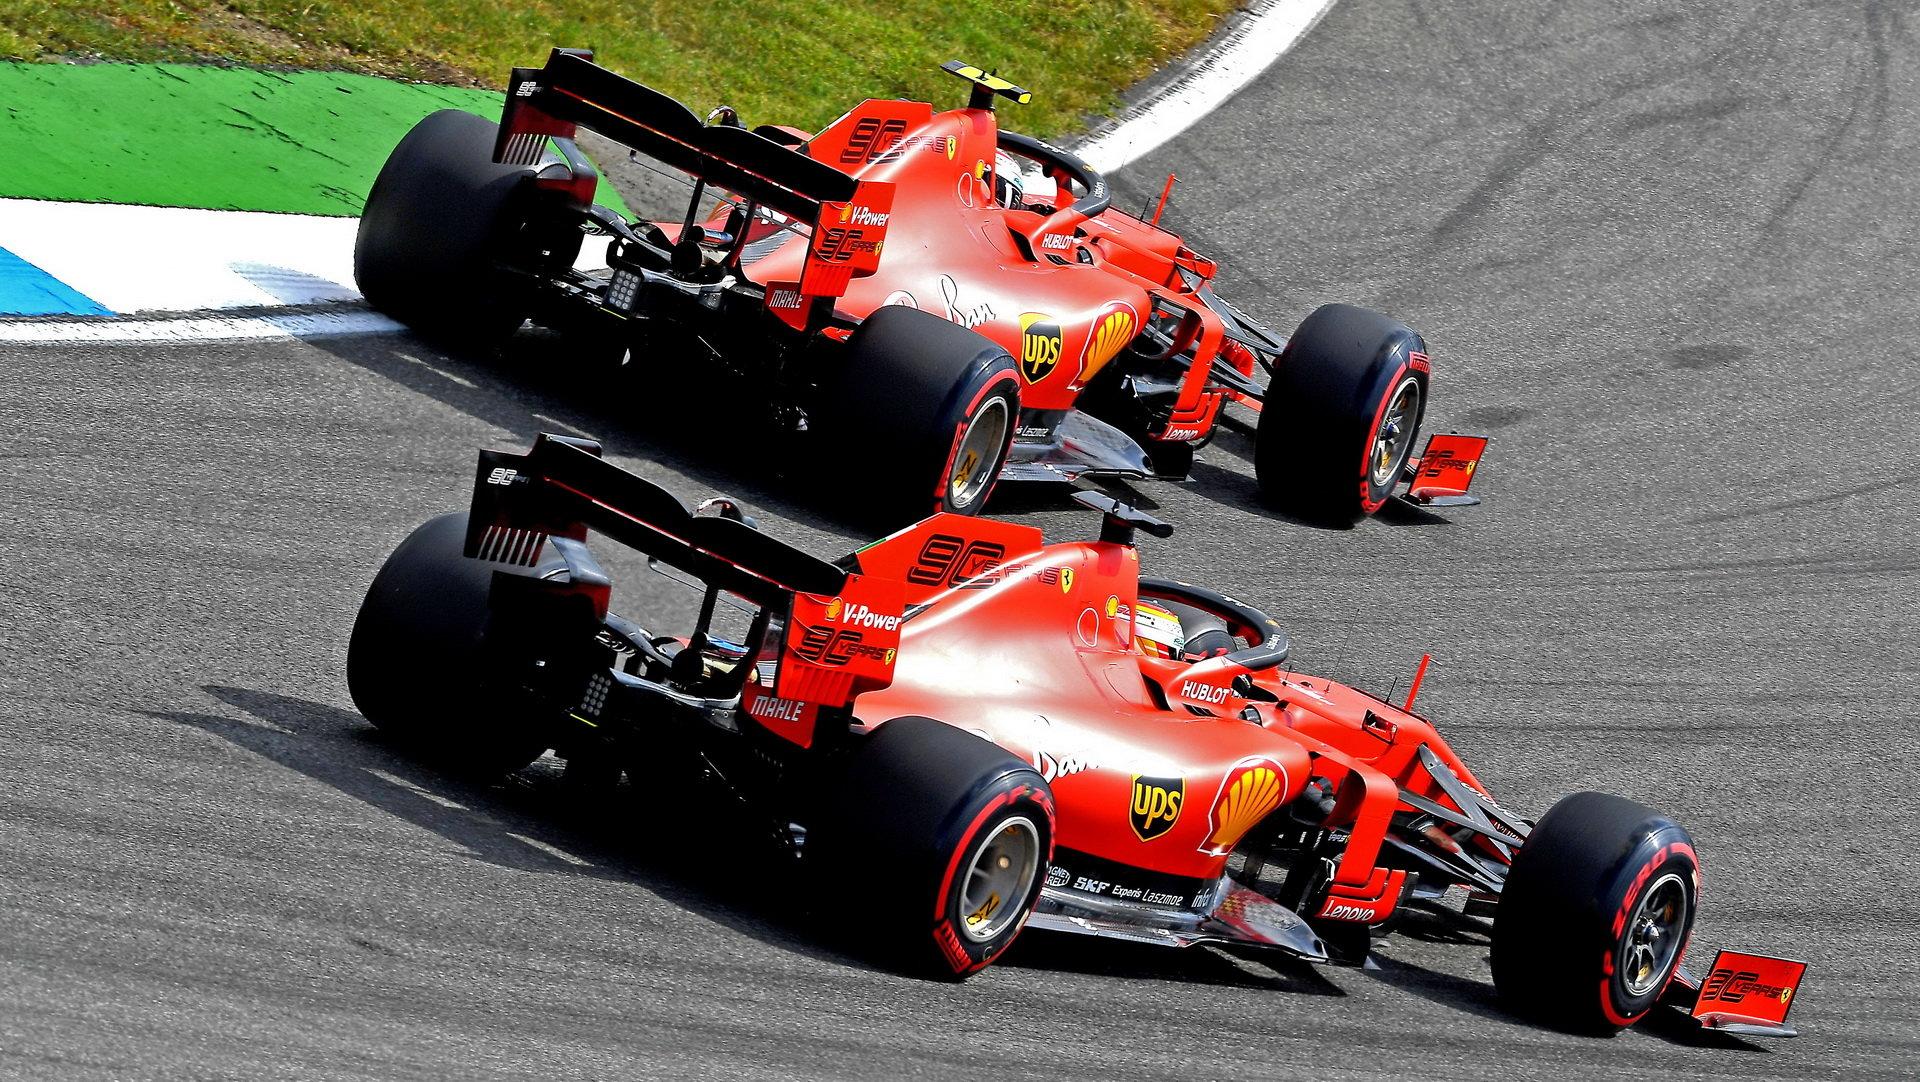 Charles Leclerc a Sebastian Vettel v kvalifikaci v Německu